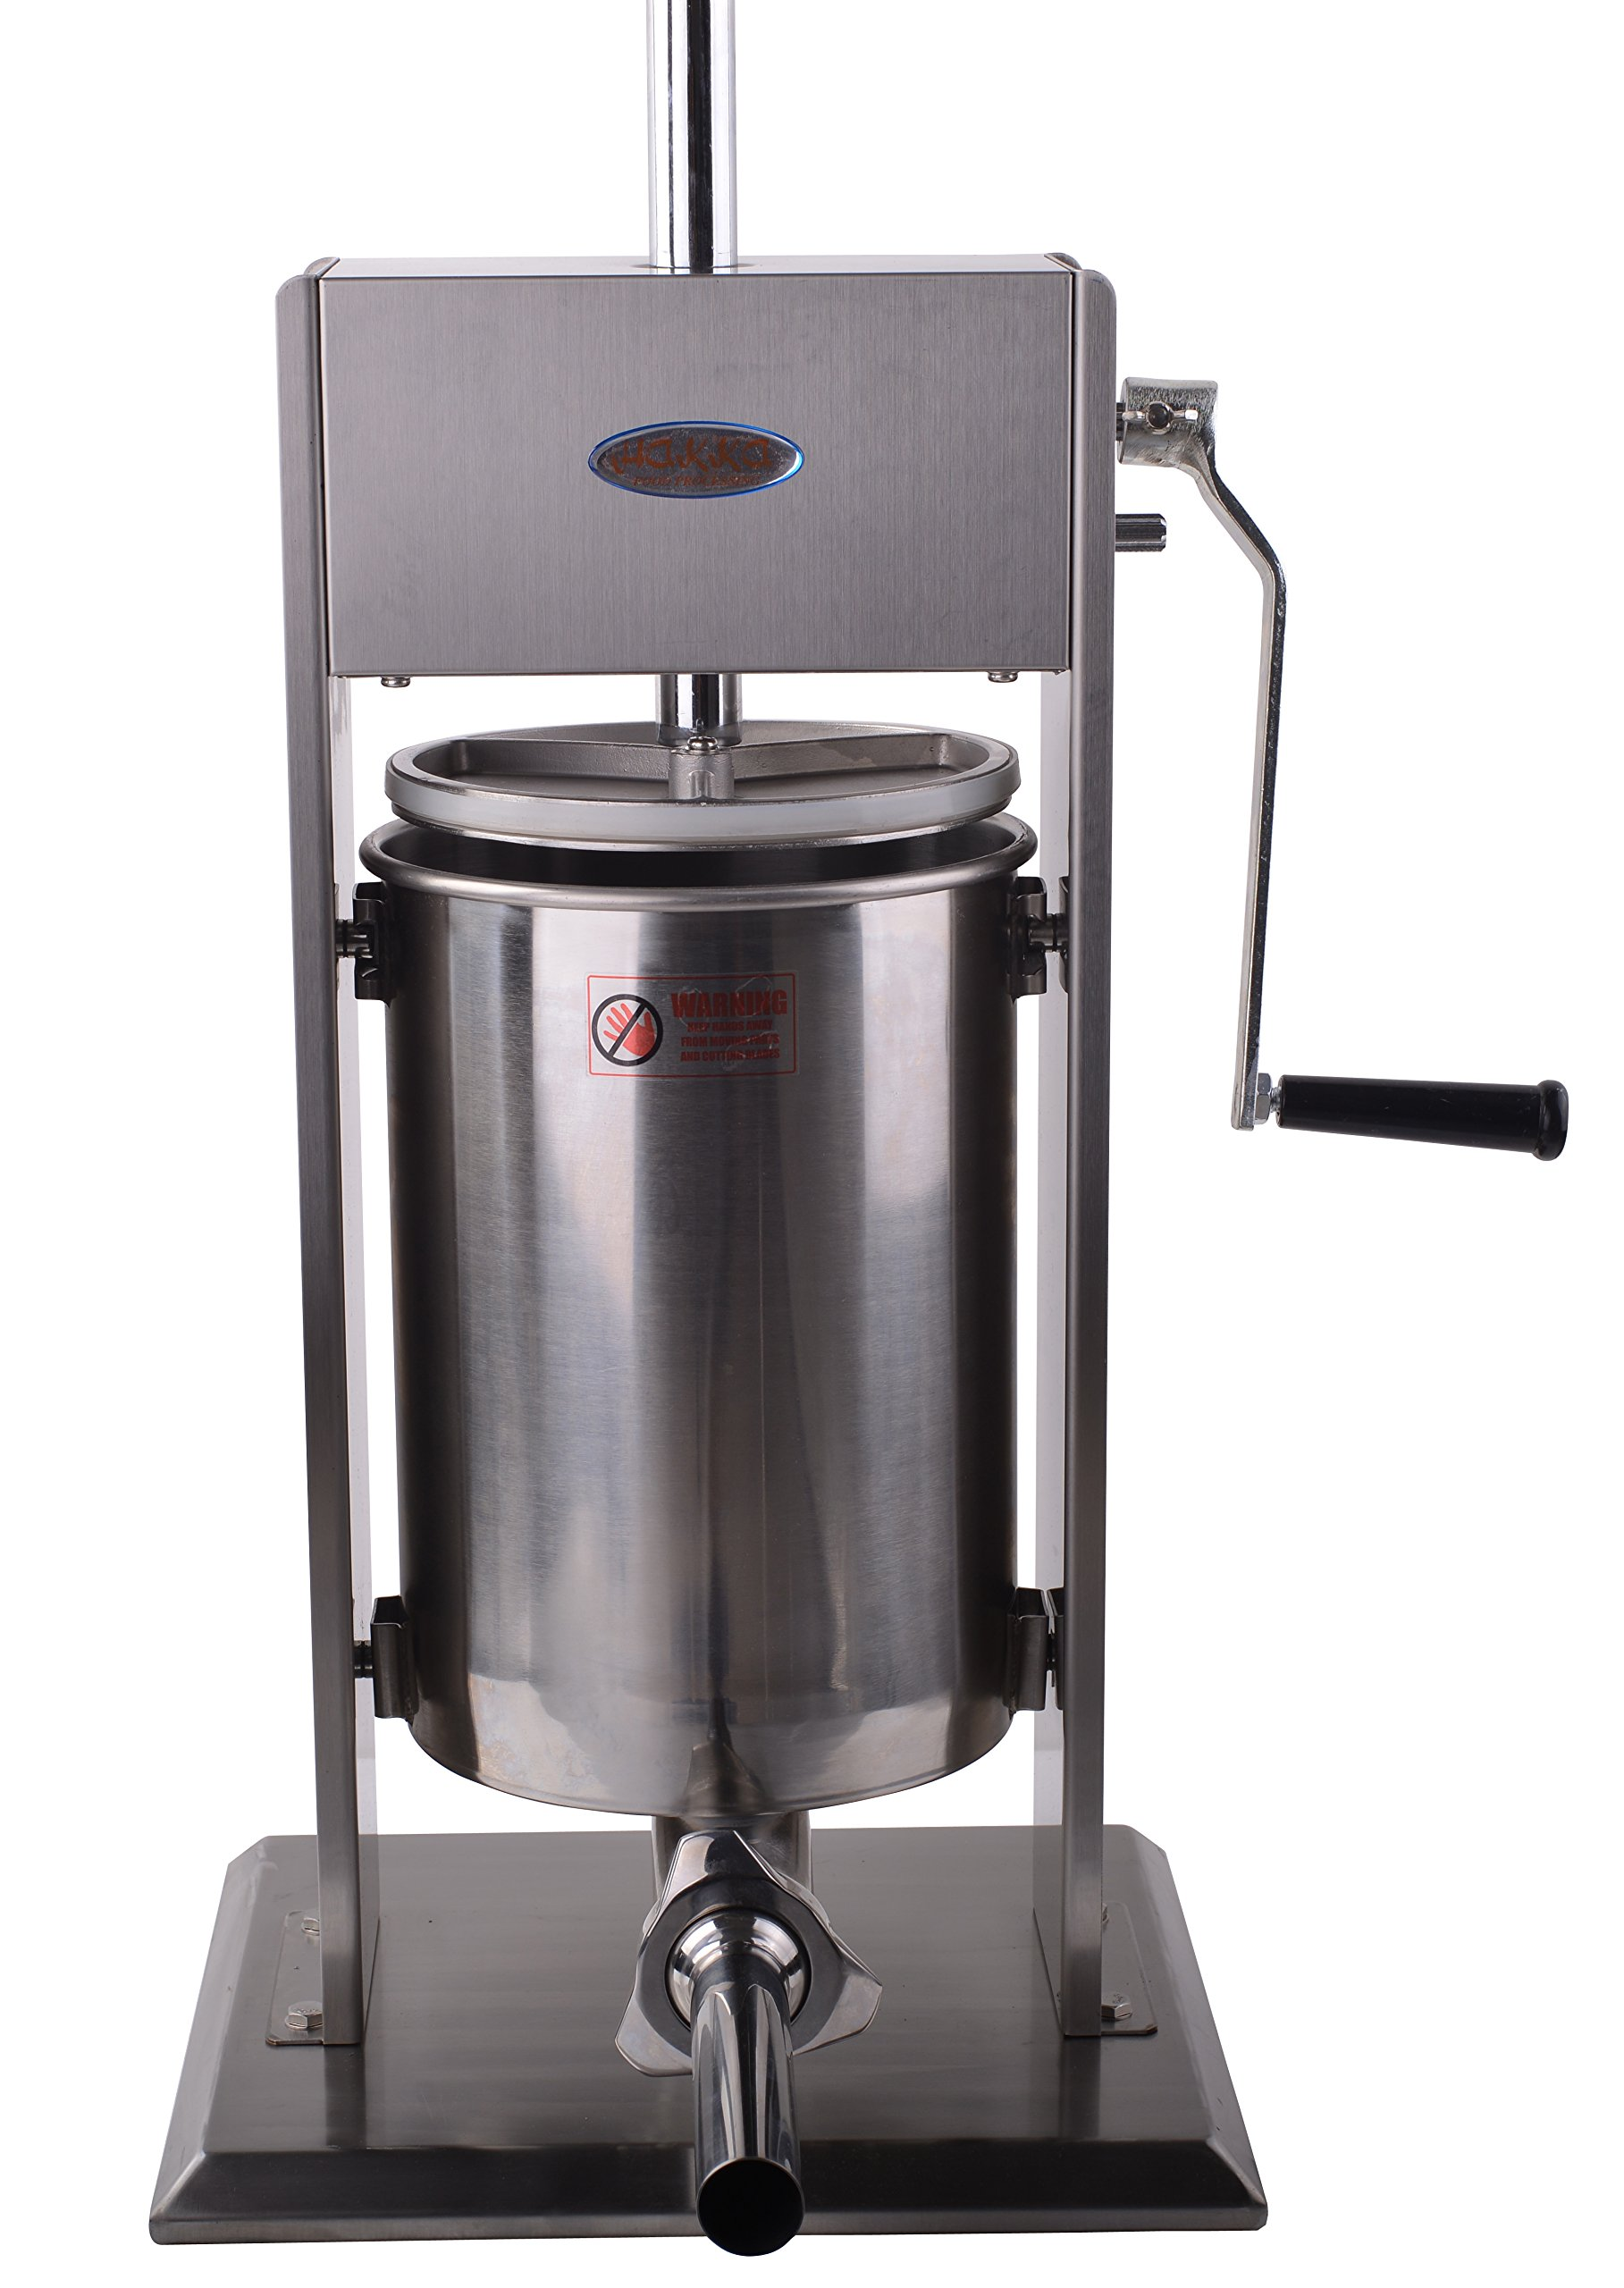 Hakka Sausage Stuffer 2 Speed Stainless Steel Vertical Sausage Maker (32Lb / 15 Liter) by HAKKA BROTHERS